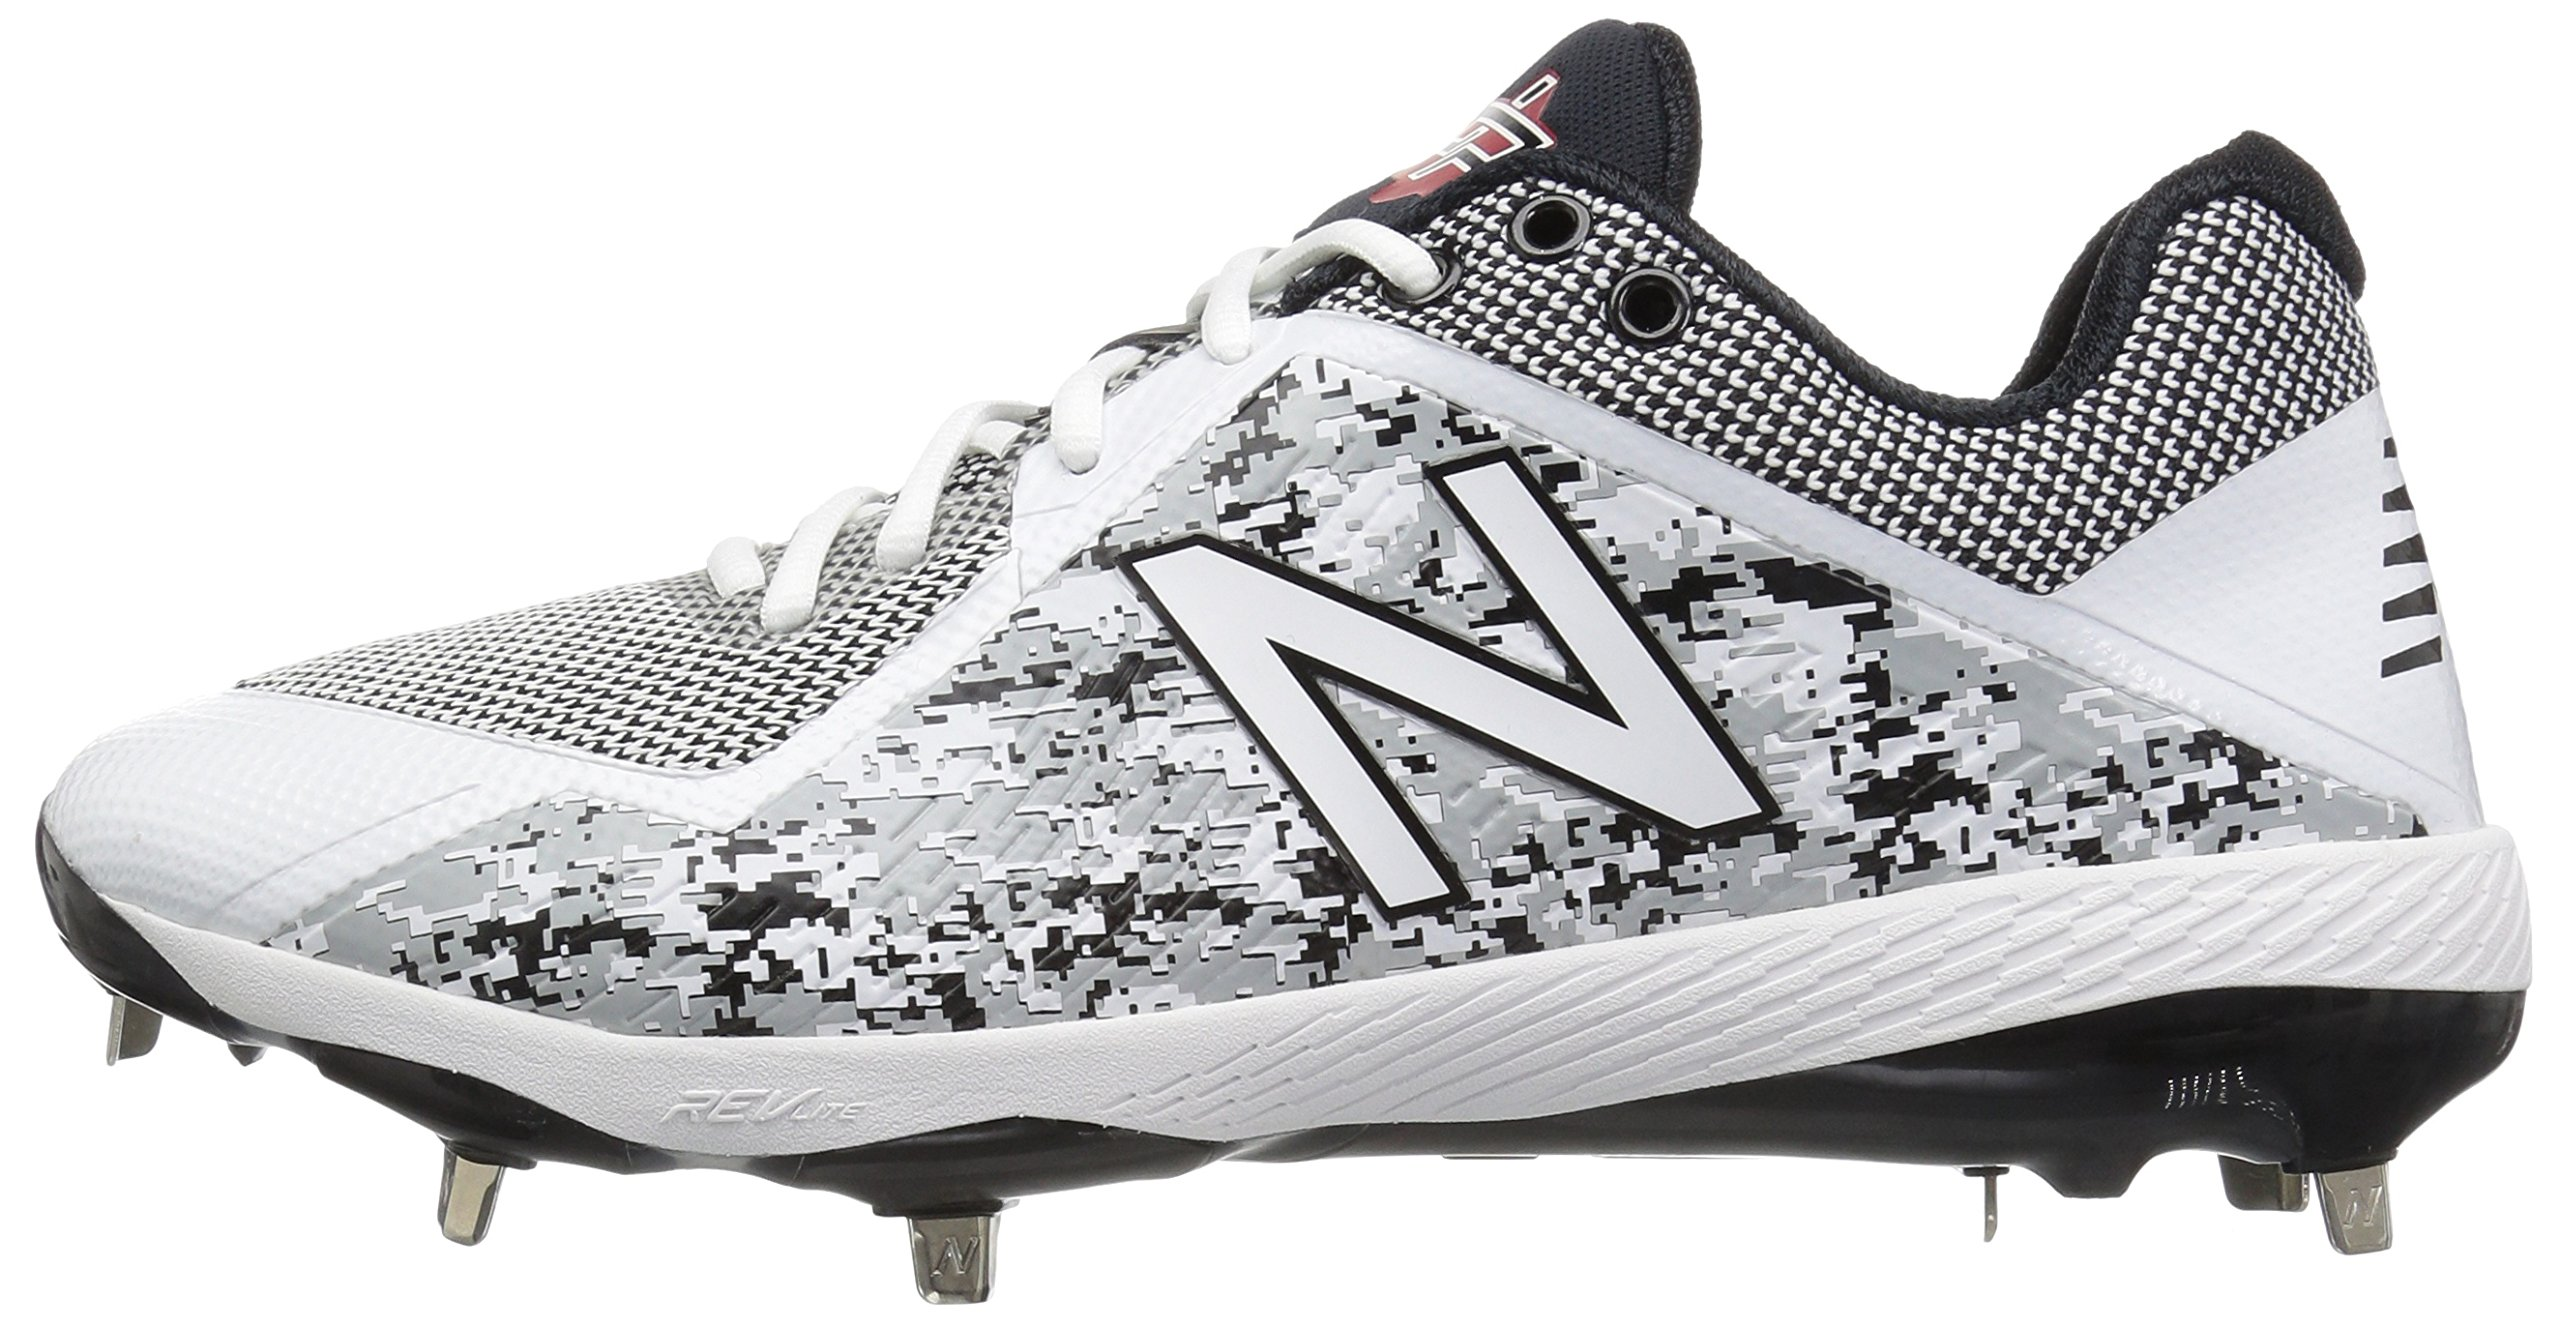 New Balance Men's L4040v4 Metal Baseball Shoe, Silver/Camo, 7.5 2E US by New Balance (Image #5)